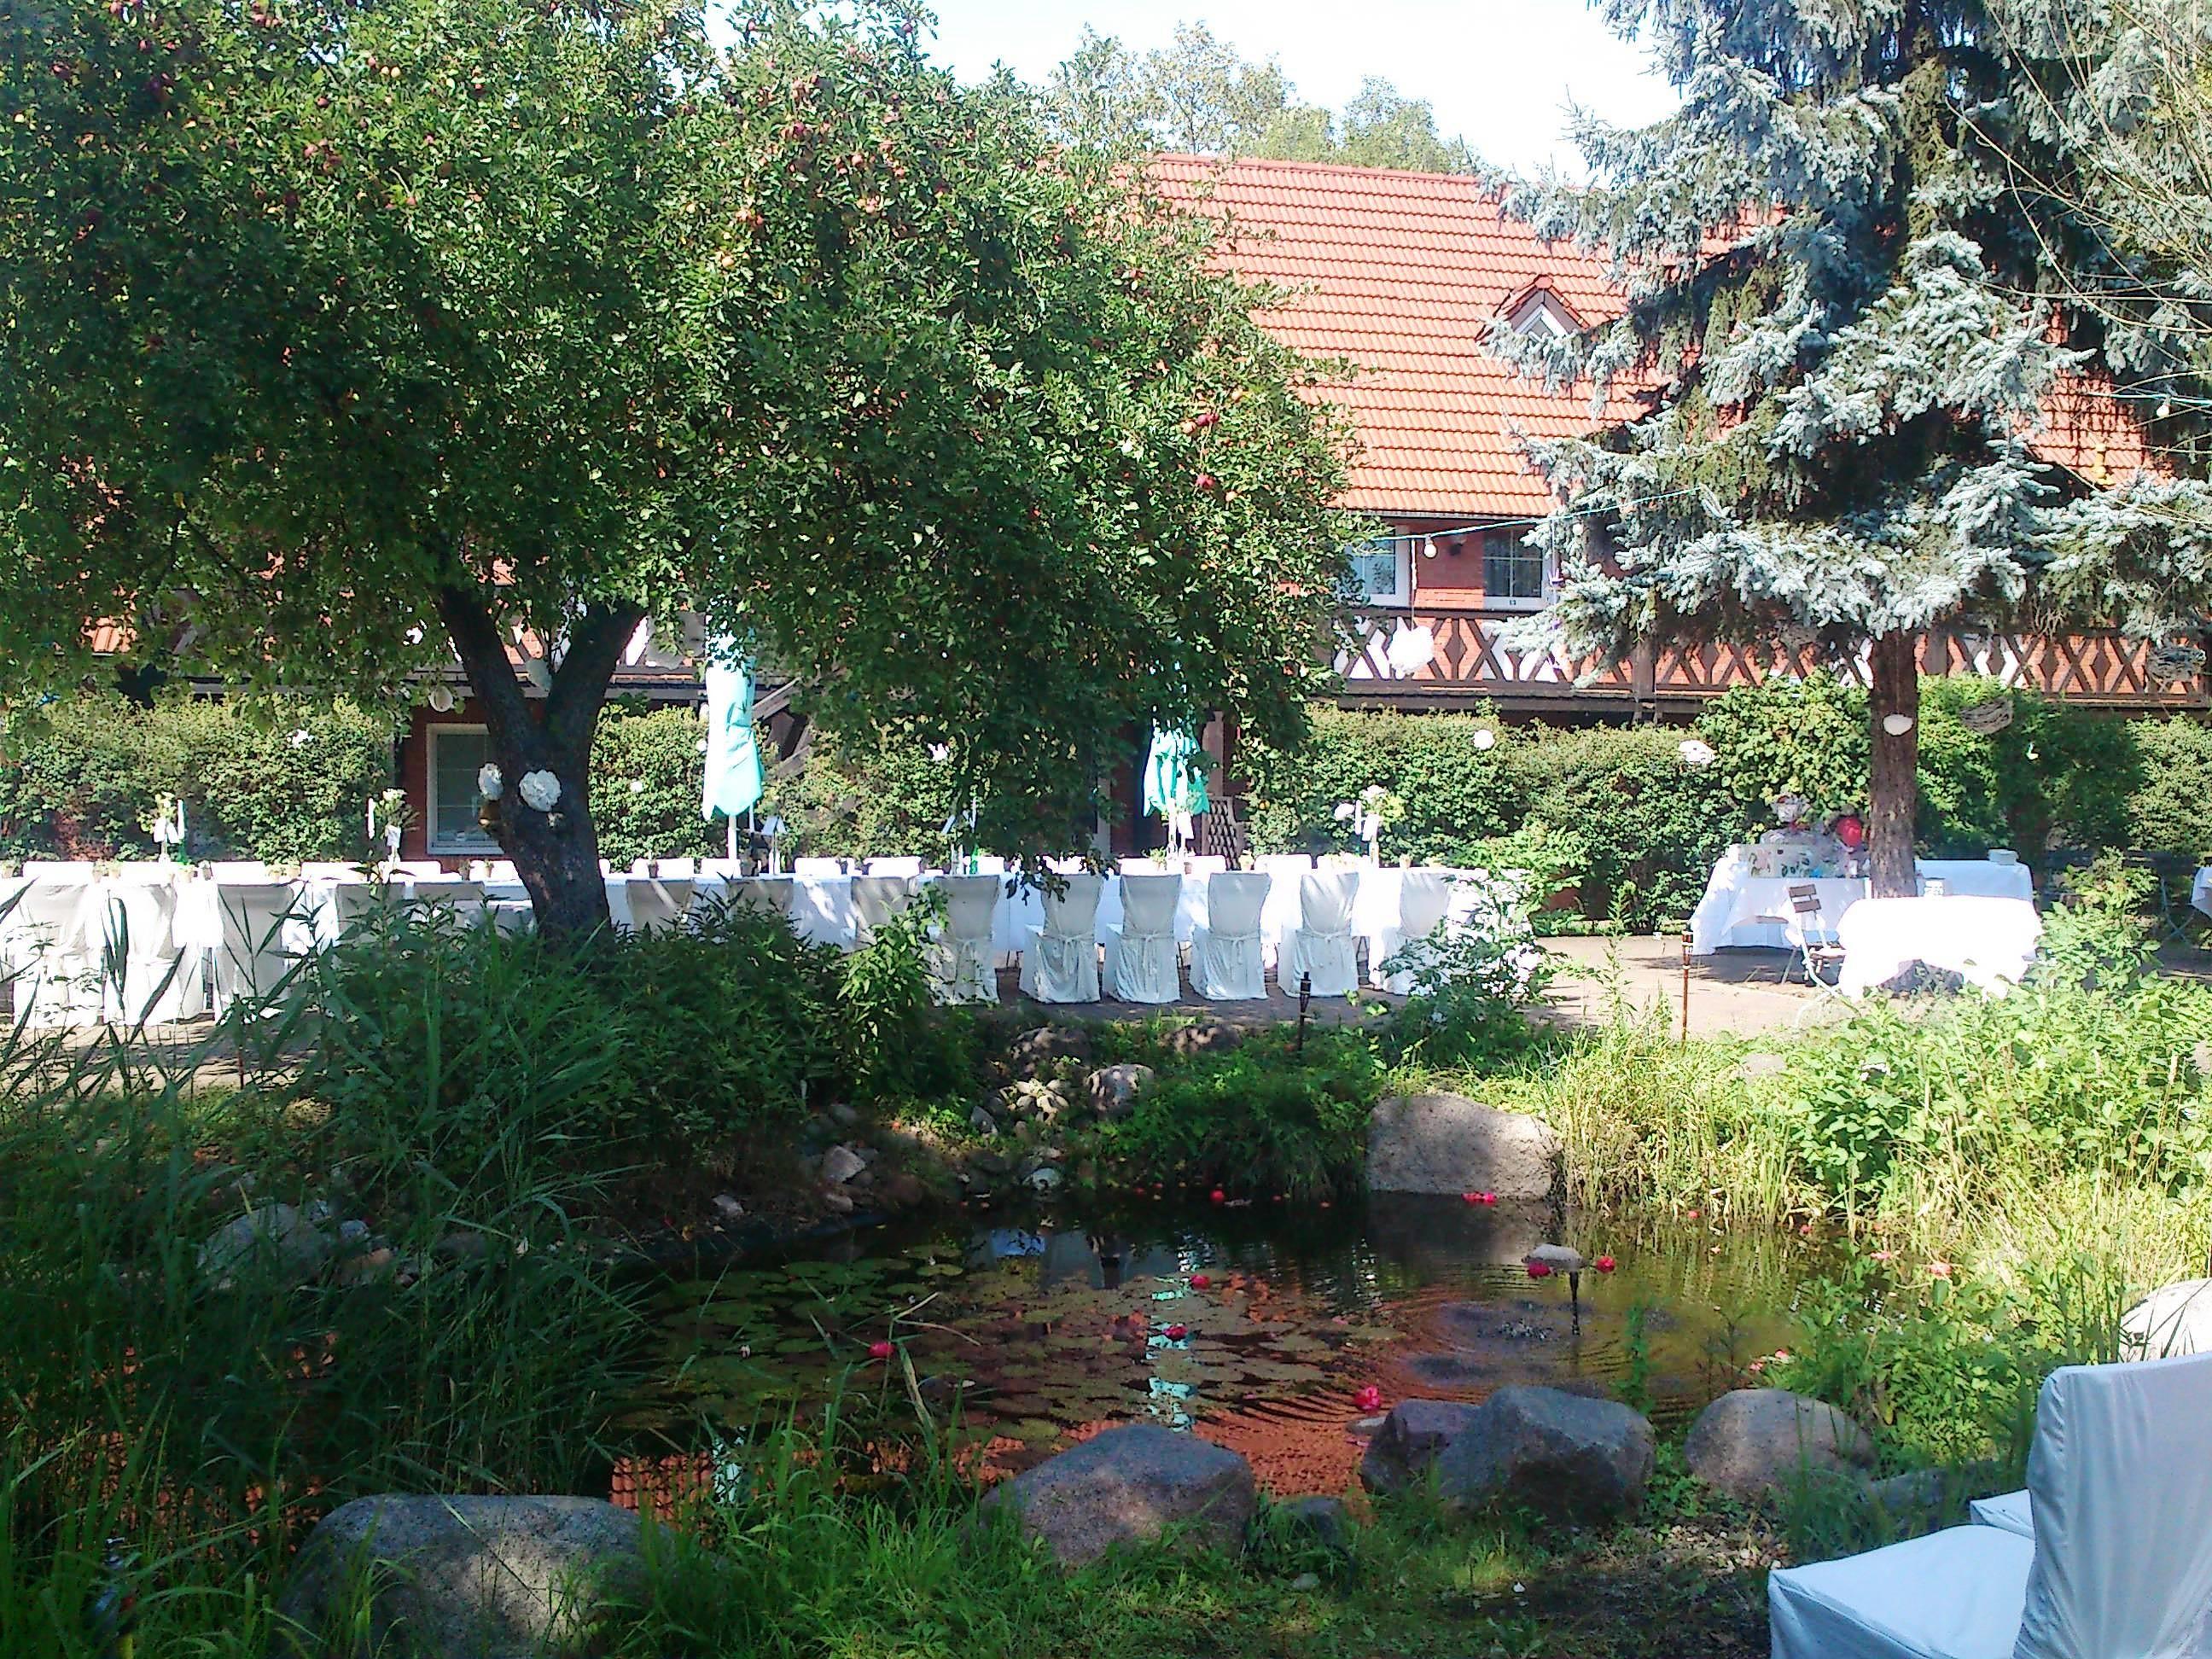 Bio-Hotel Kolonieschänke Burg, Spreewald, Burg (Spreewald)